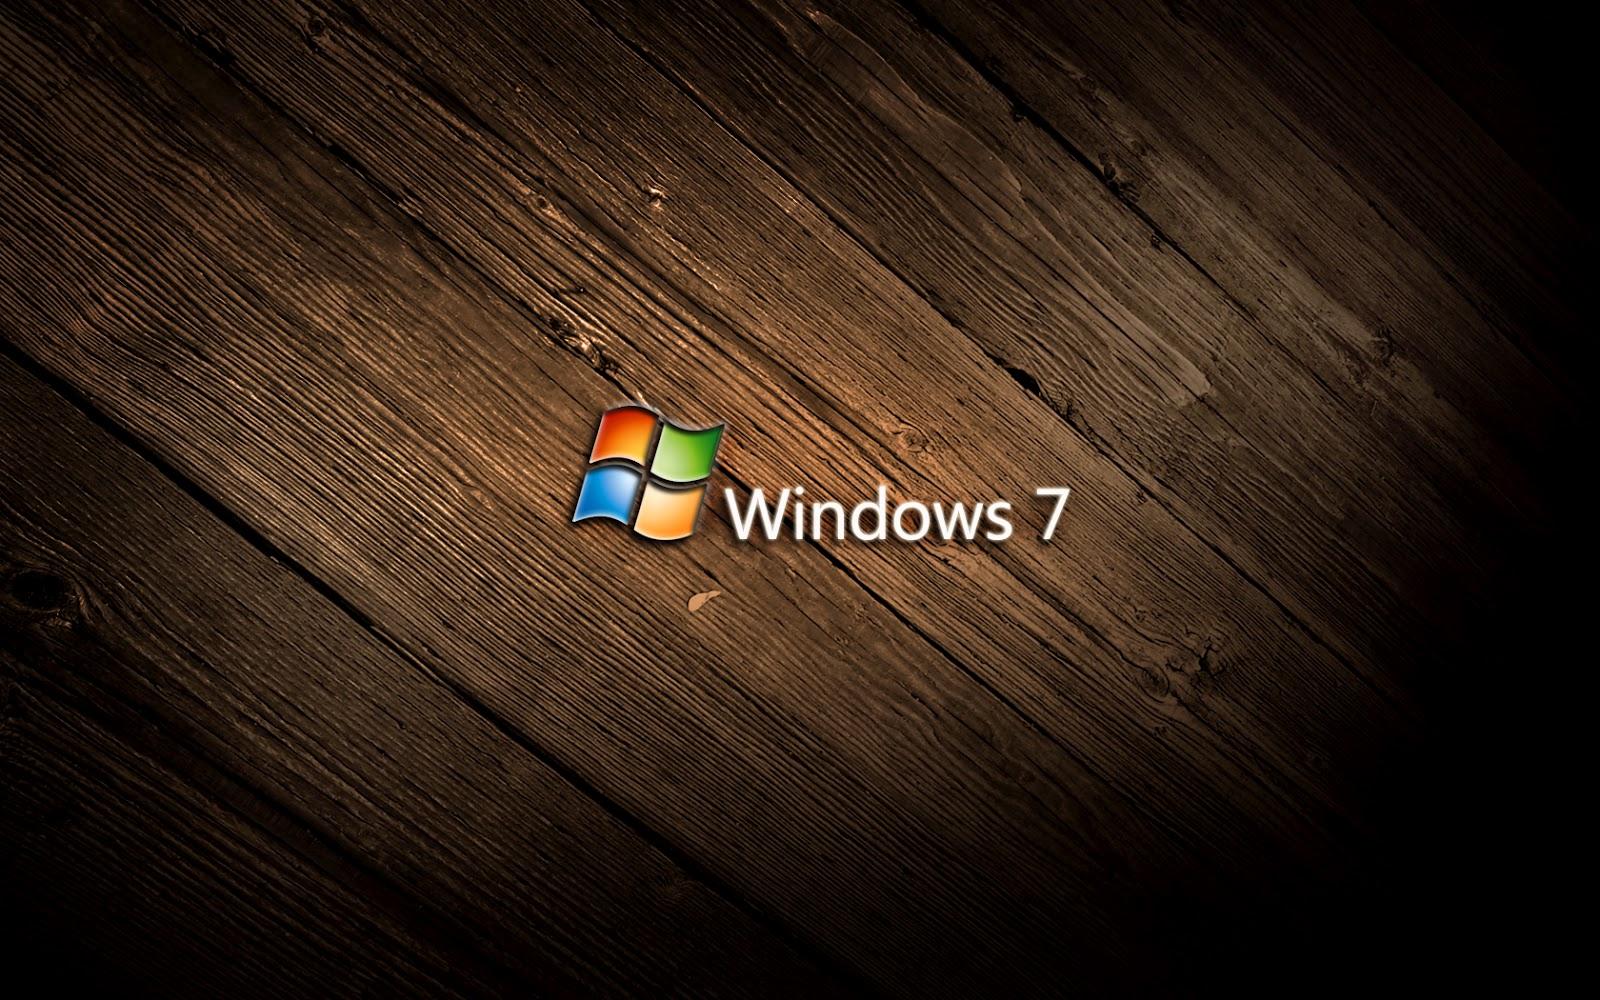 Labels: Windows 7 , Windows 7 HD Wallpapers , Windows 7 Wallpapers